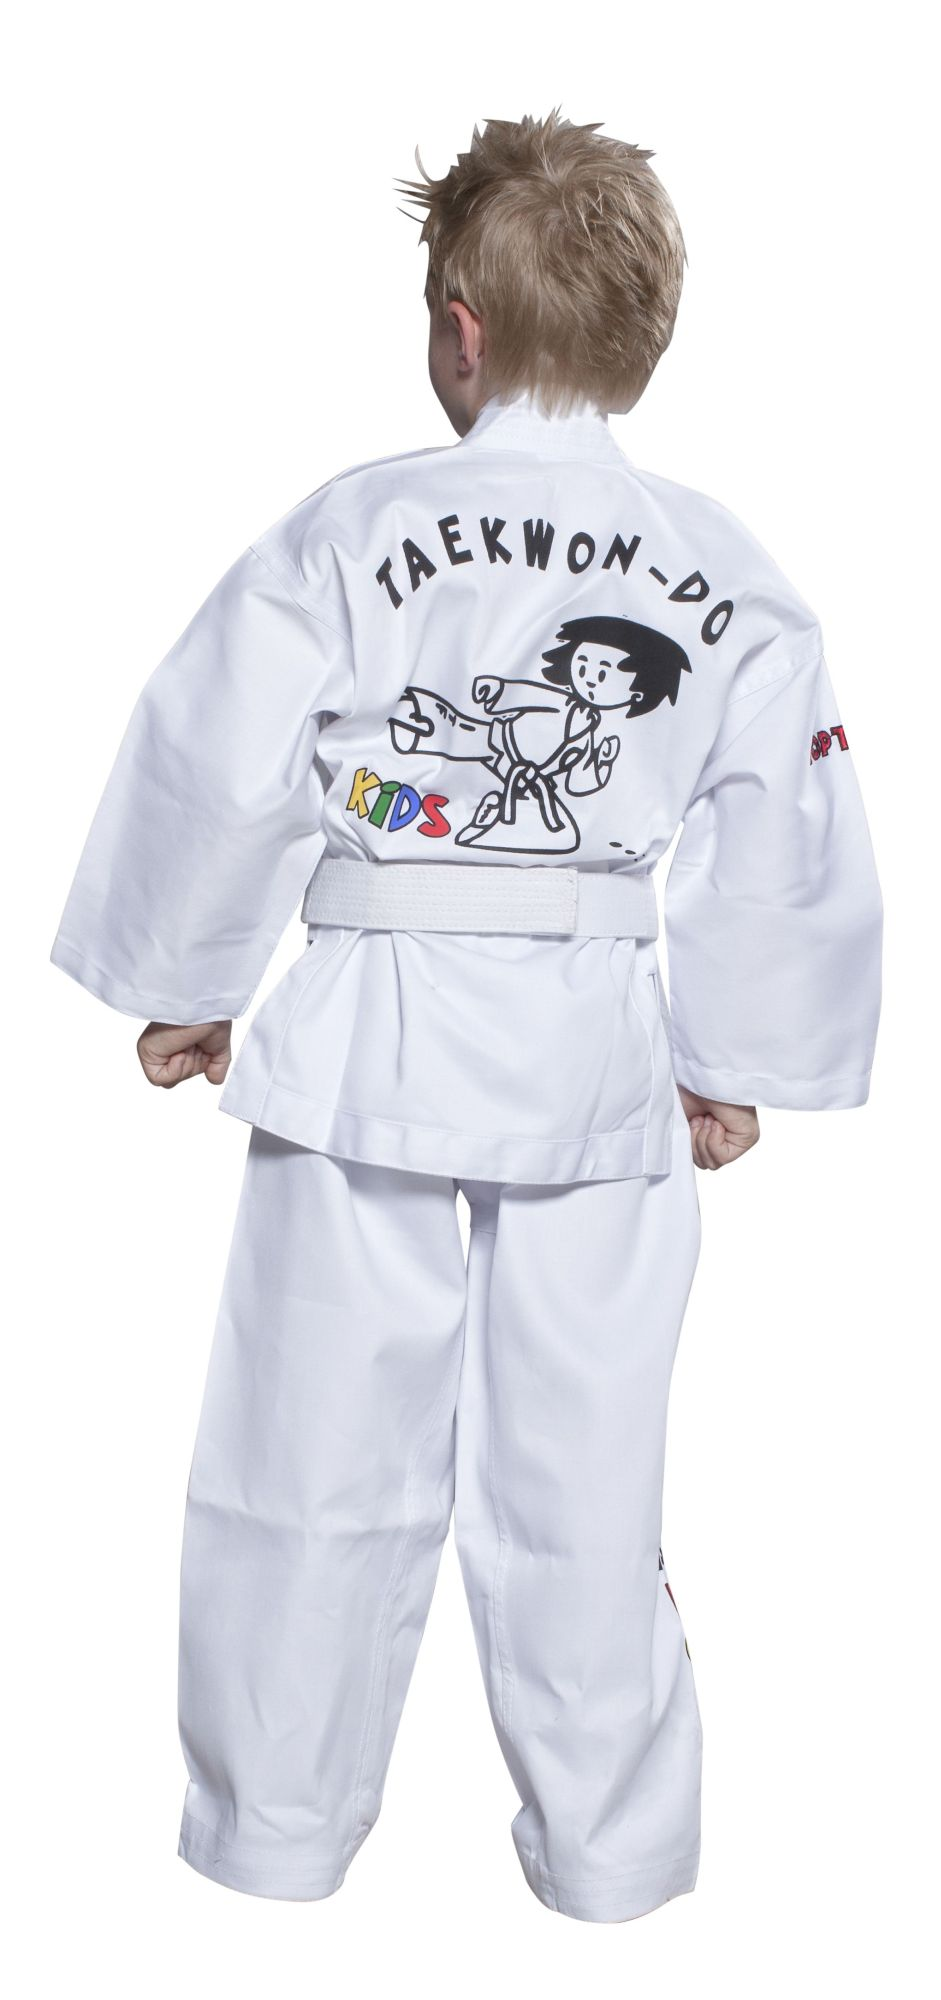 "TOP TEN Taekwondopak ""ITF KIDS"" Wit"